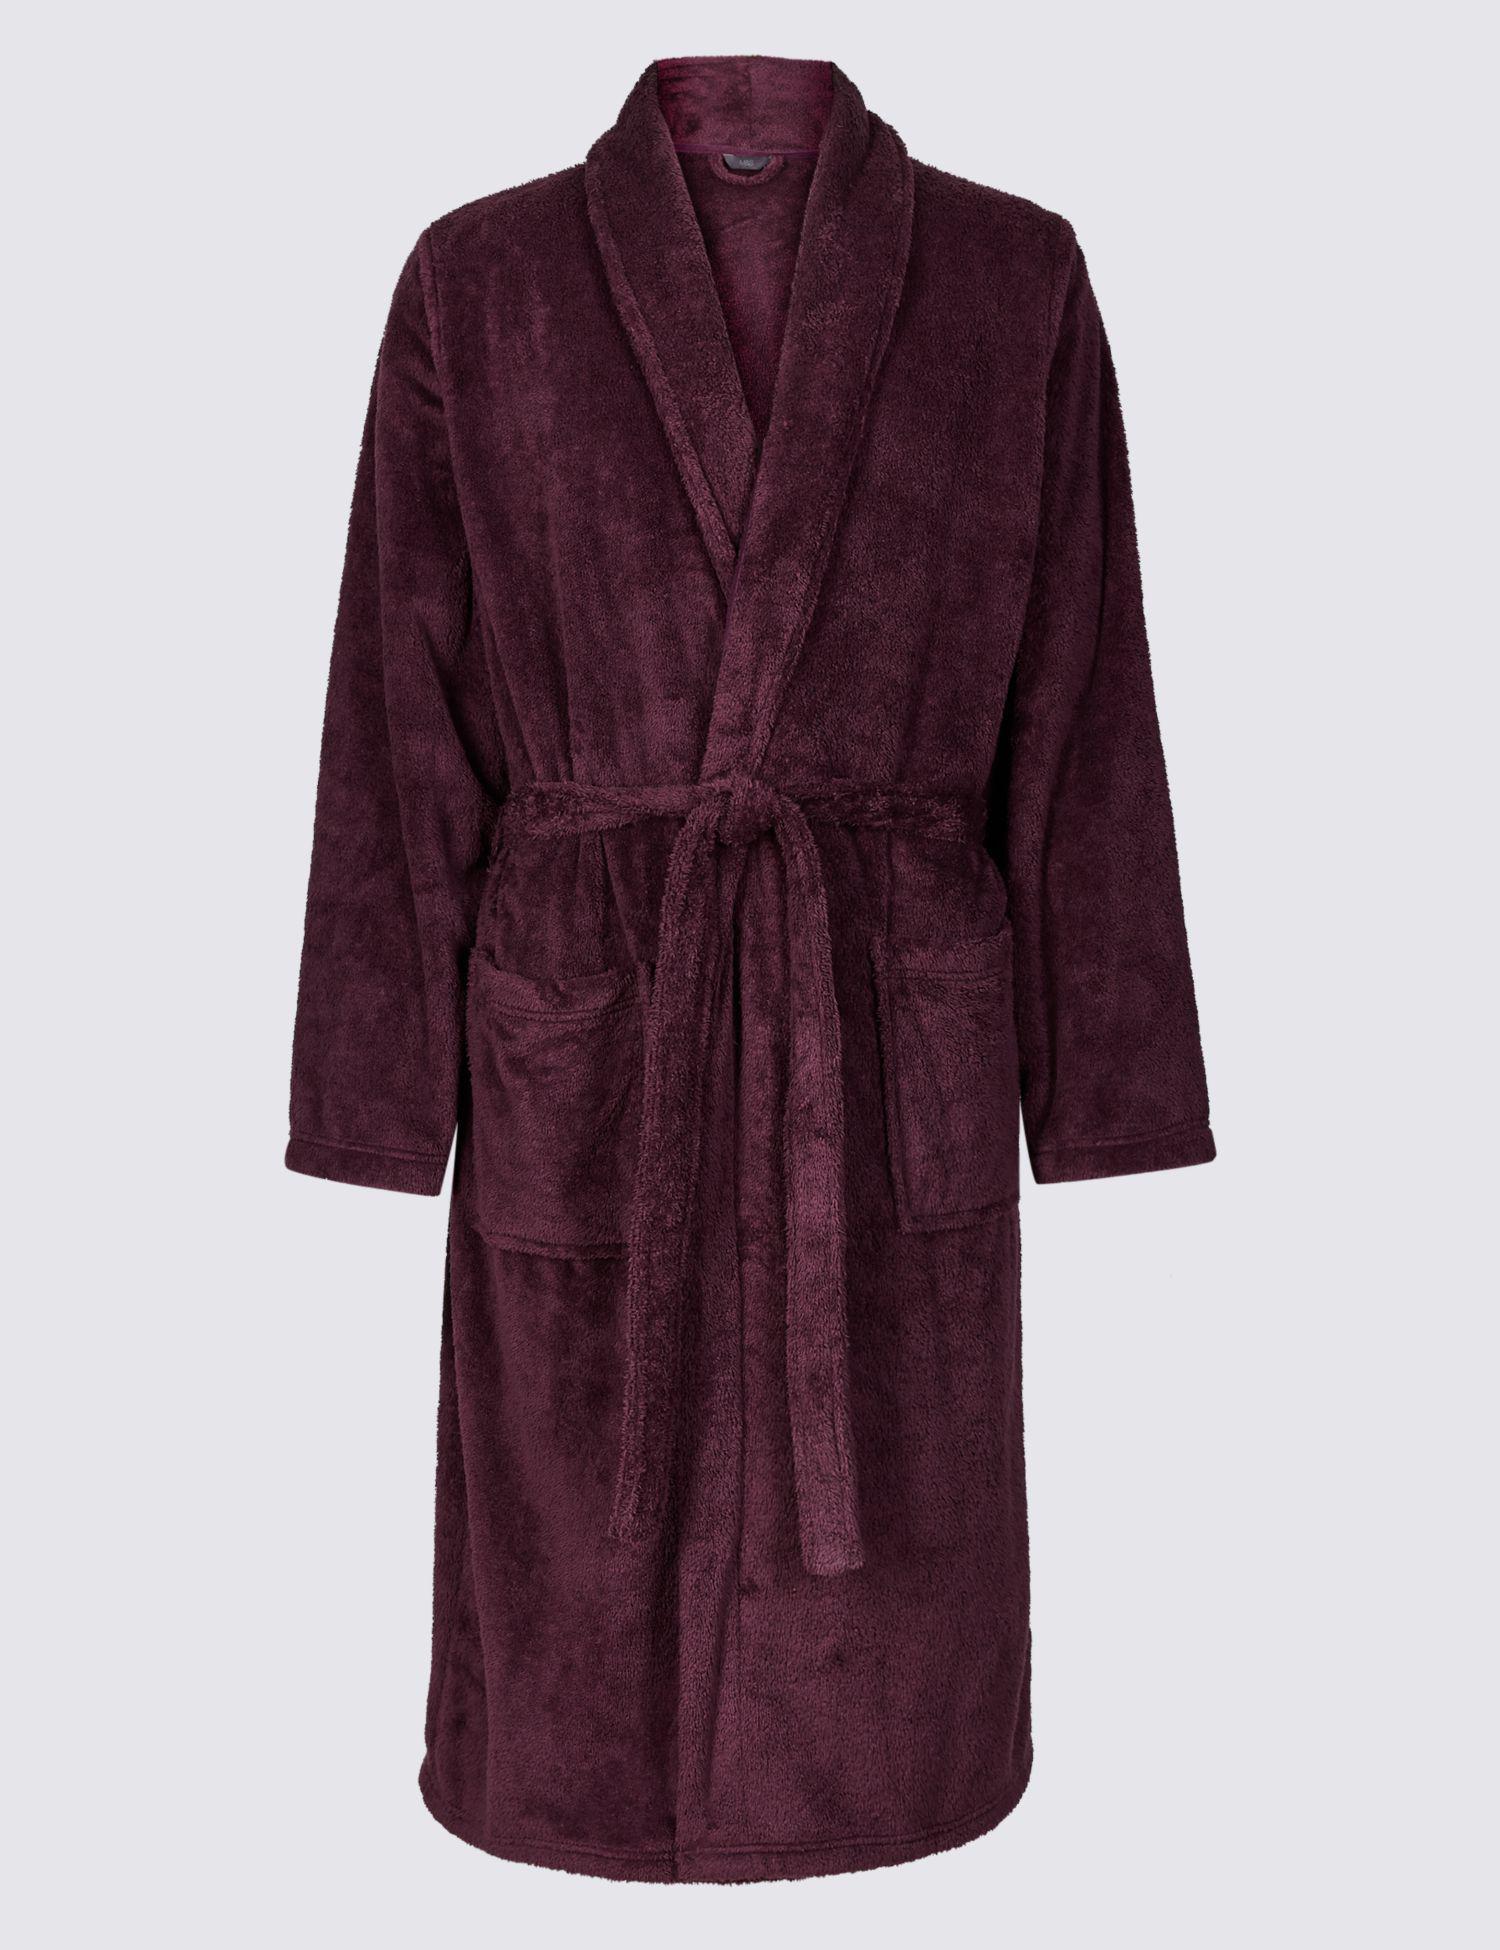 Marks & Spencer Supersoft Fleece Dressing Gown in Purple for Men - Lyst